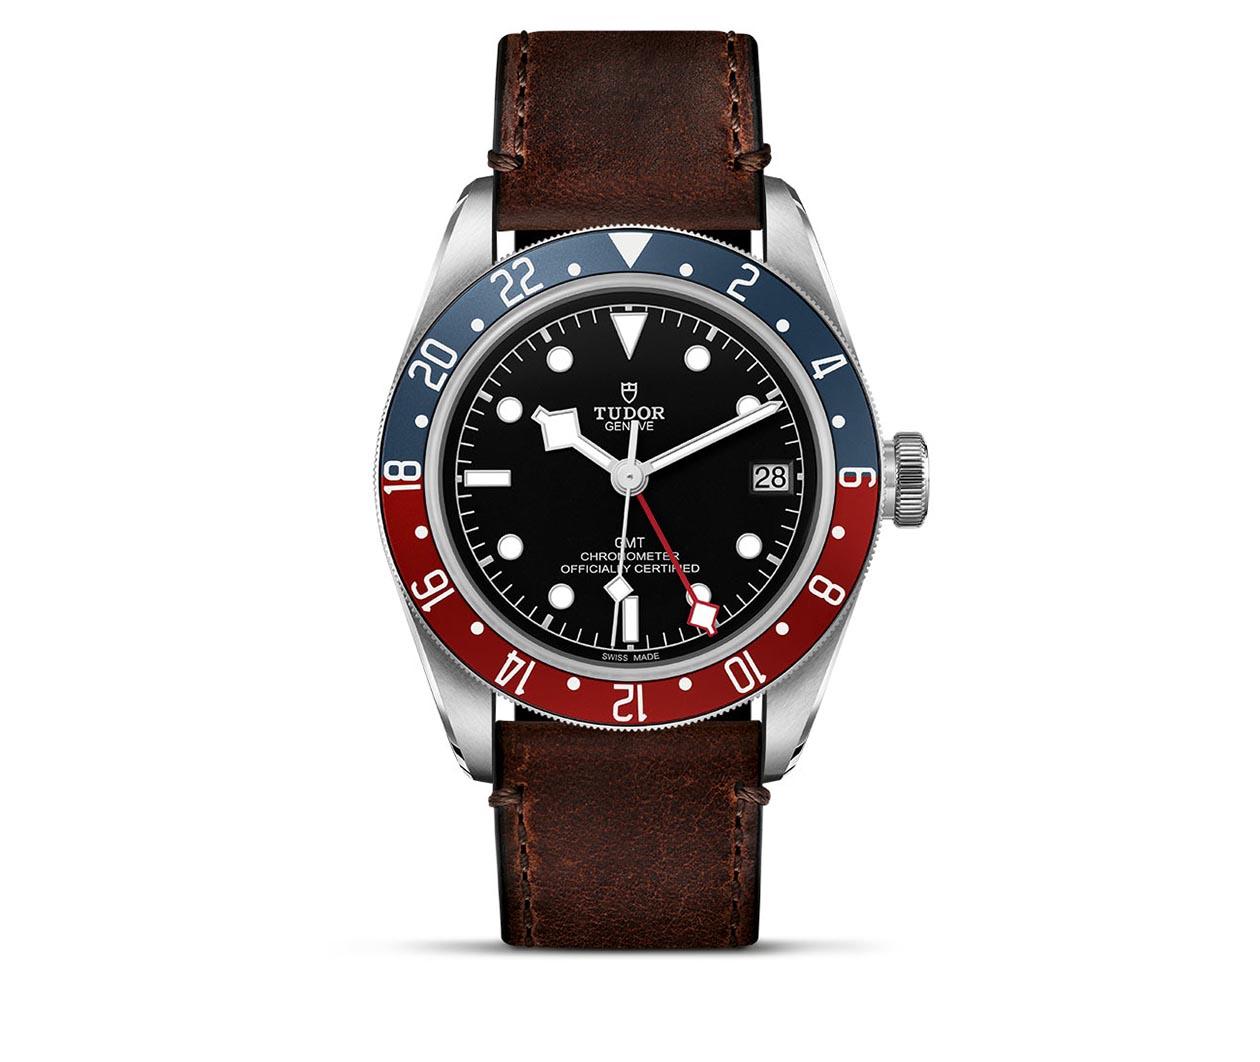 TUDOR Black Bay GMT M79830RB 0002 FINAL